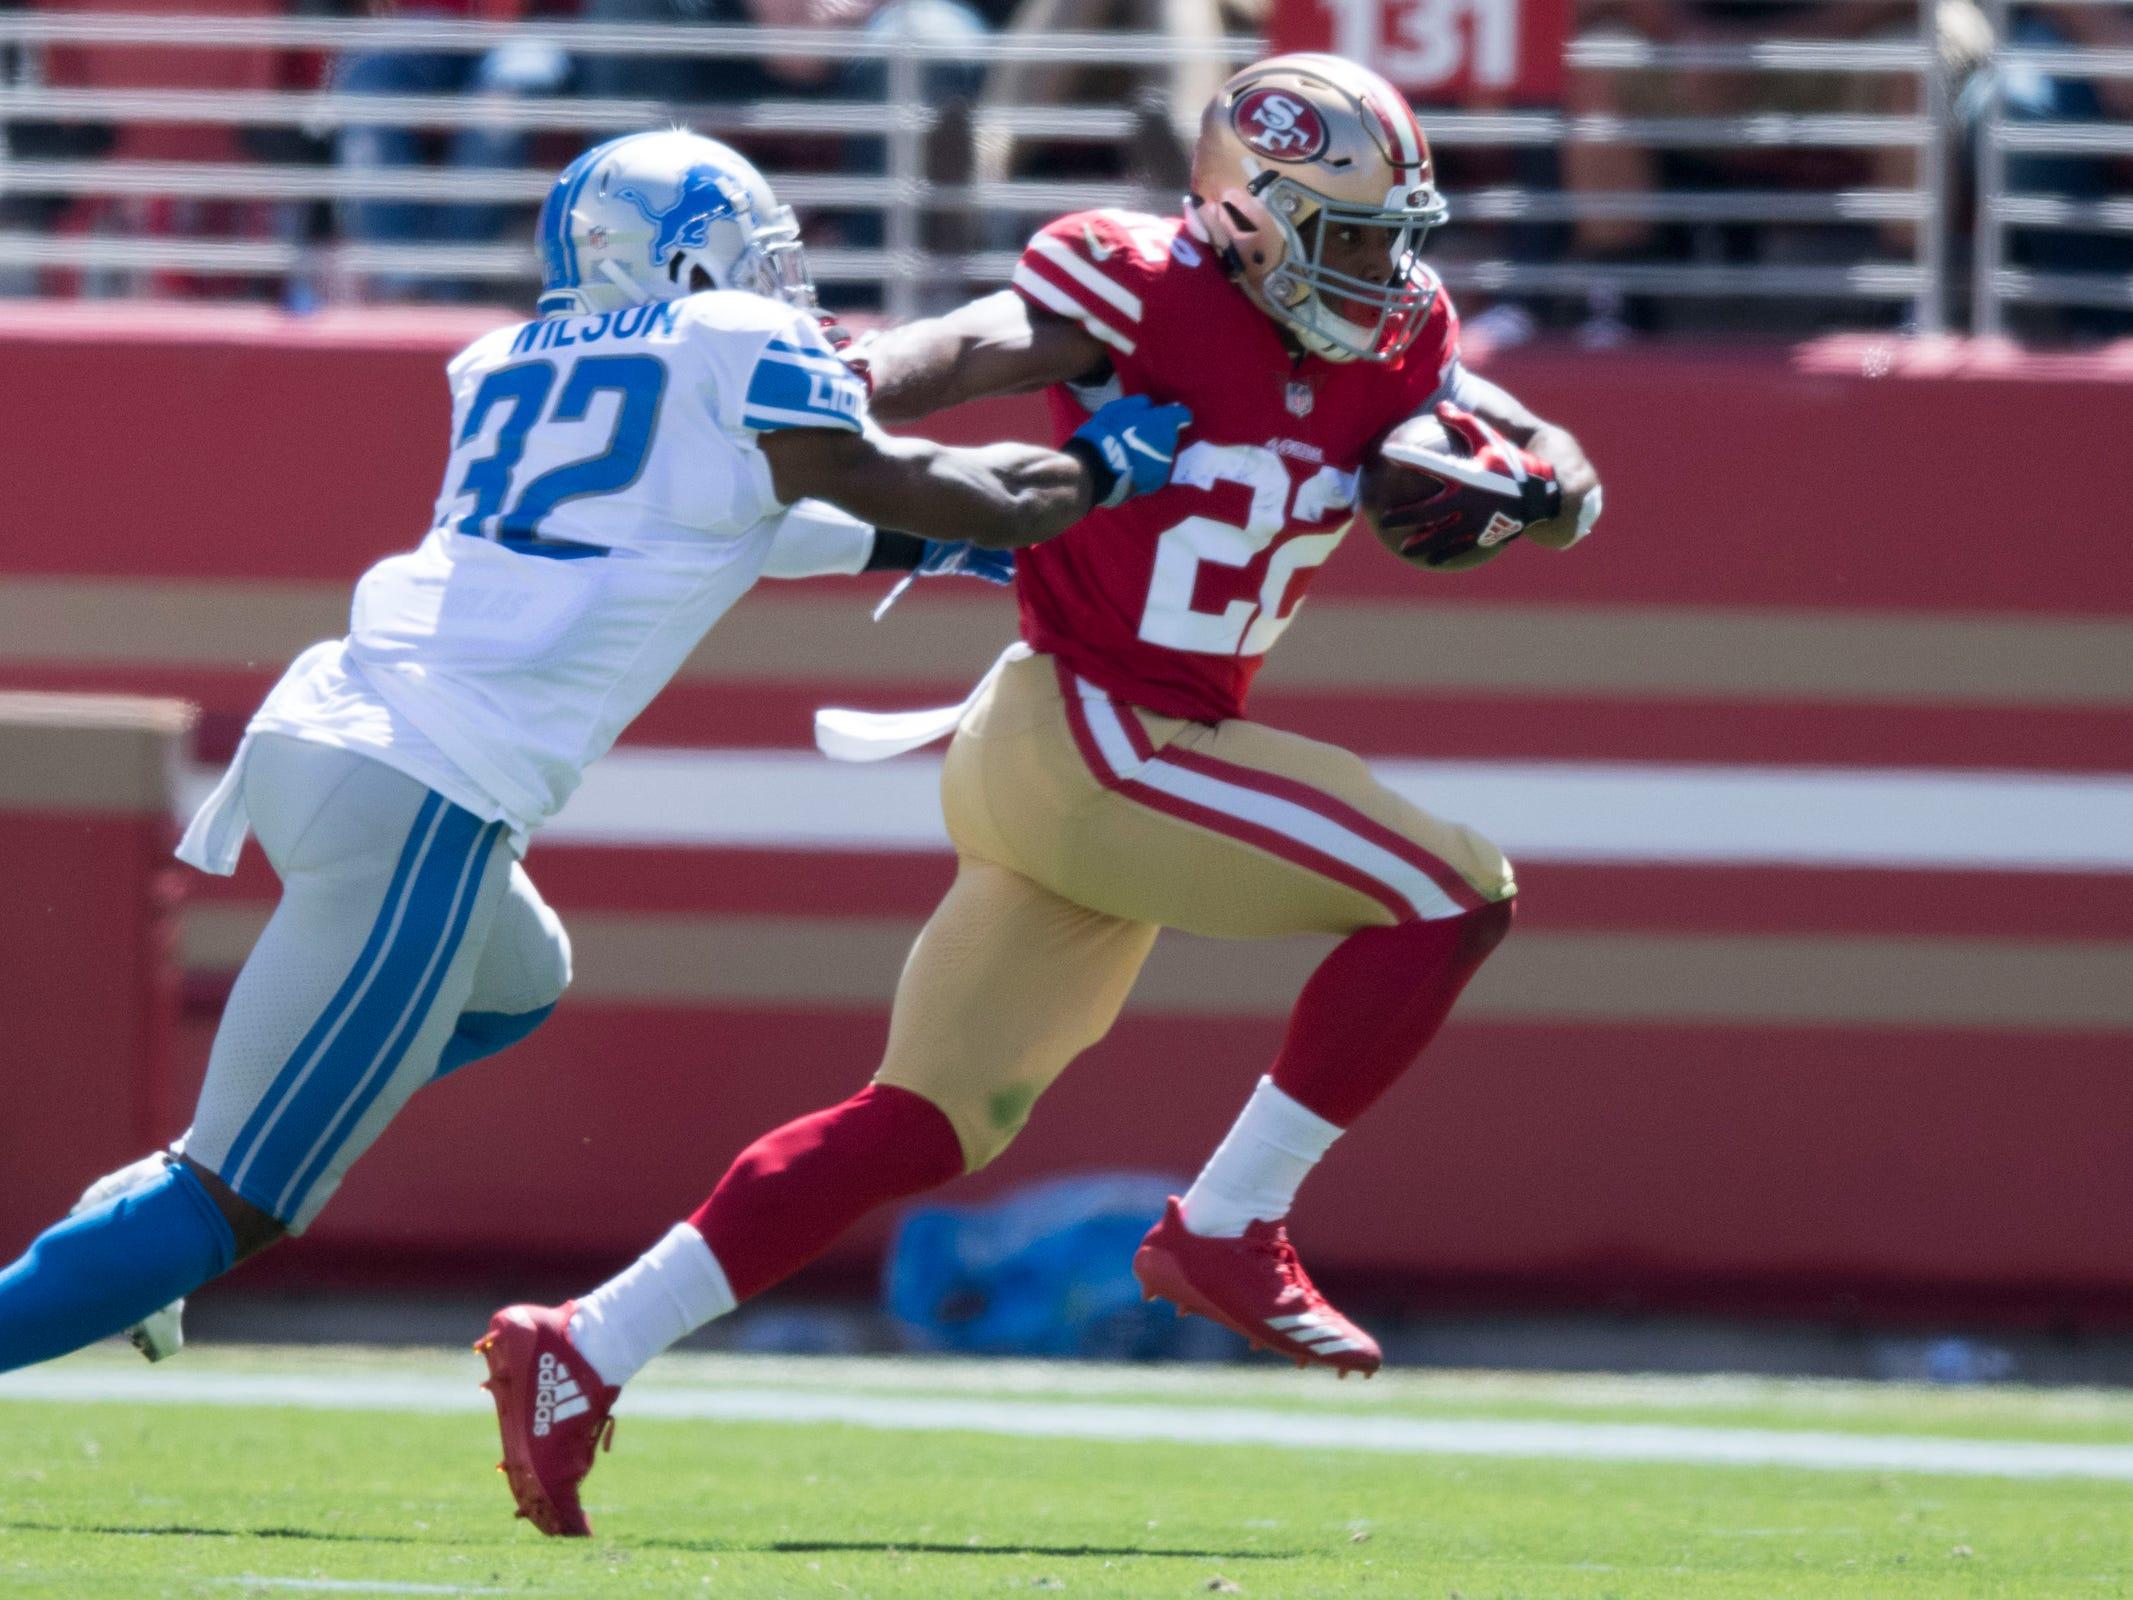 49ers running back Matt Breida is tackled by Lions defensive back Tavon Wilson during the first quarter Sunday, Sept. 16, 2018, in Santa Clara, Calif.